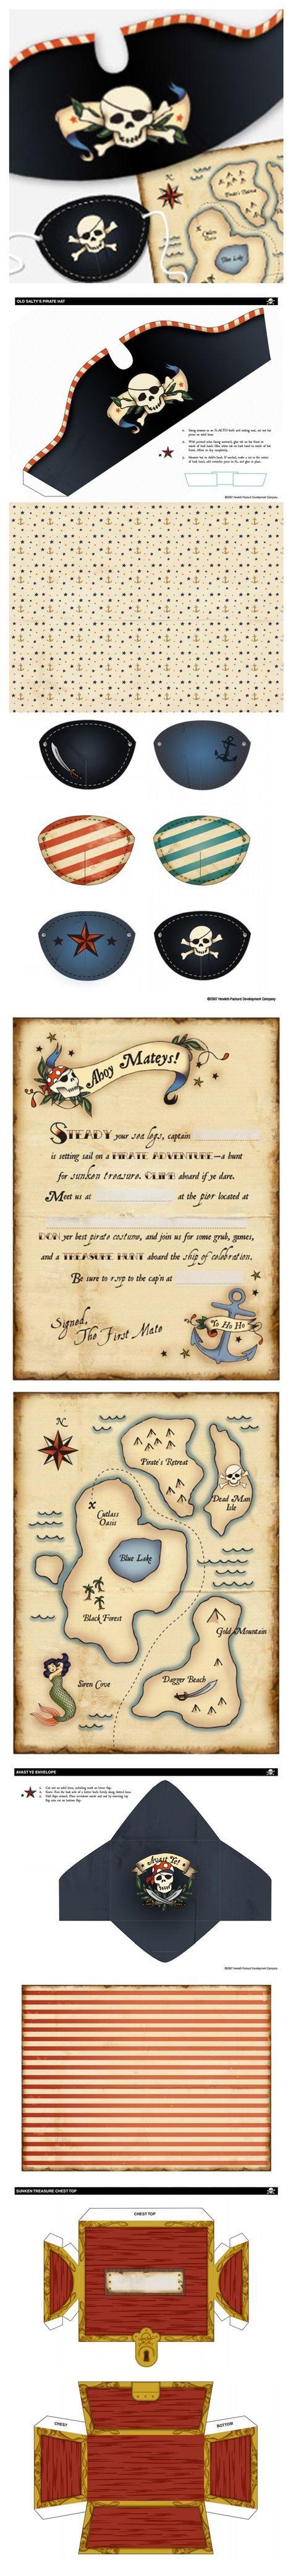 Anniversaires pirates - Free printables